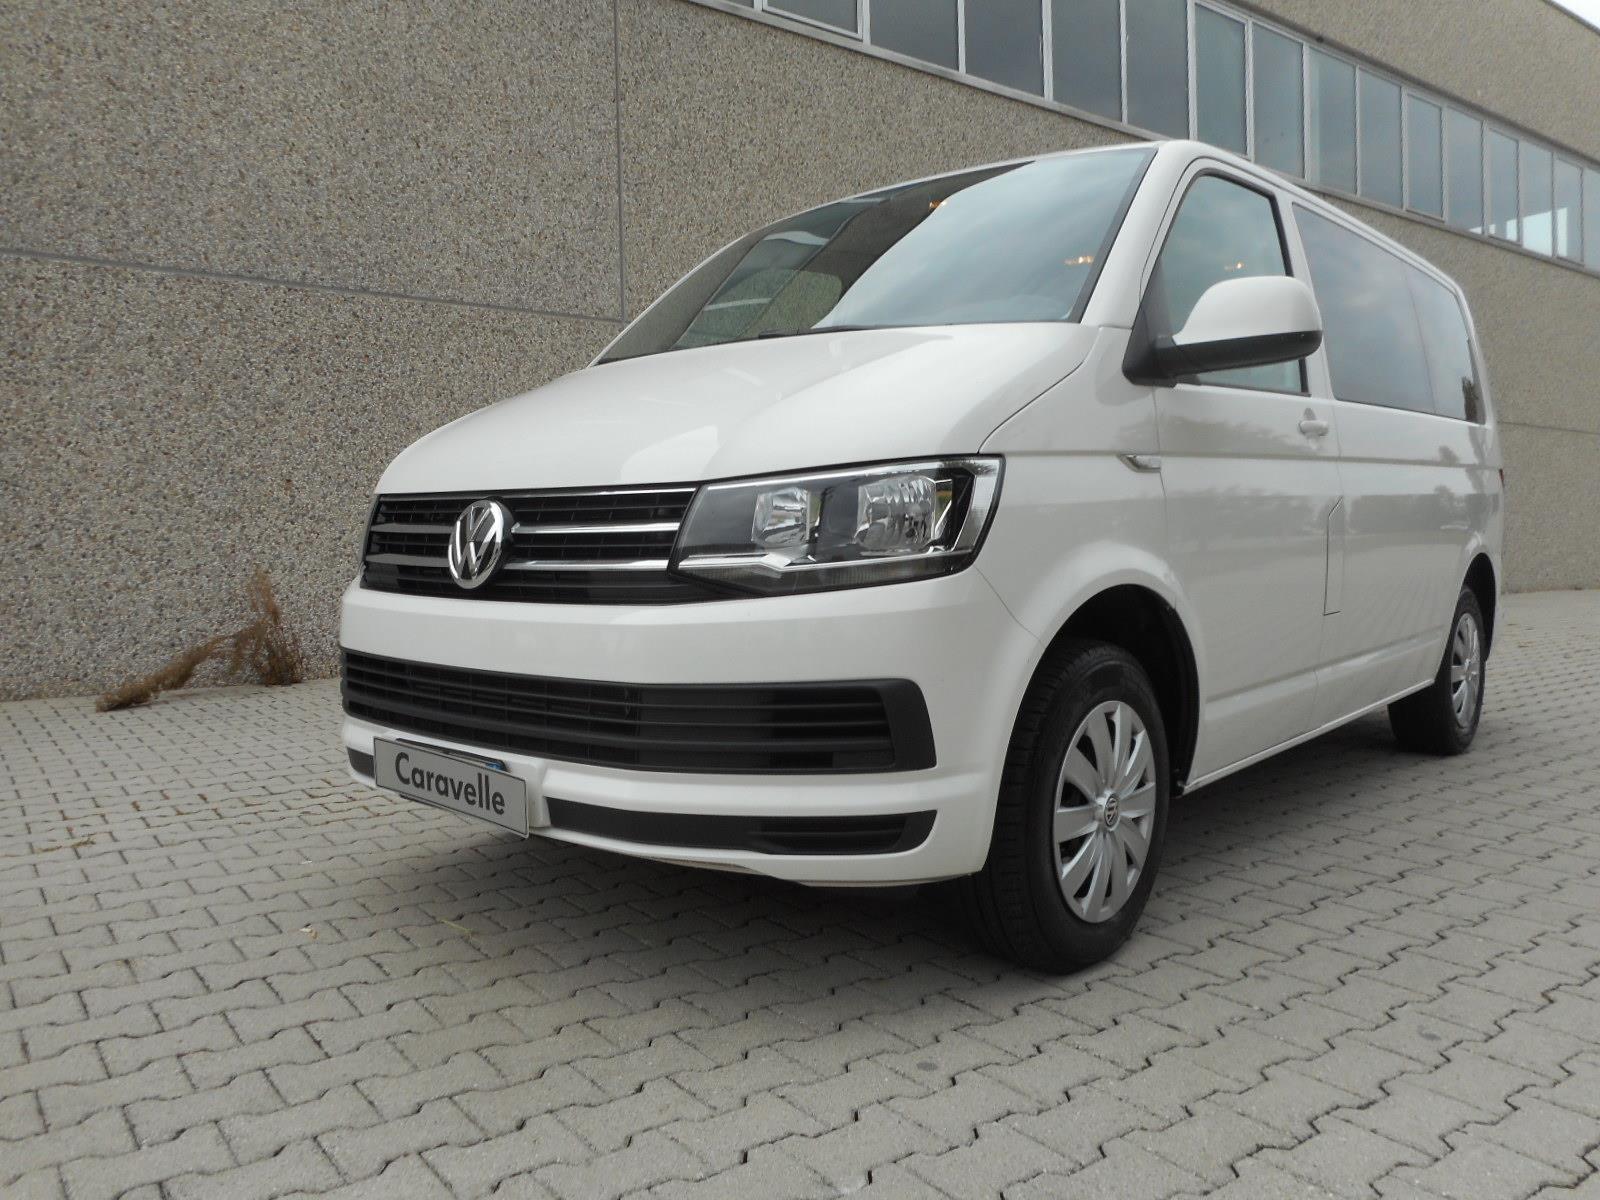 Volkswagen CARAVELLE Usato